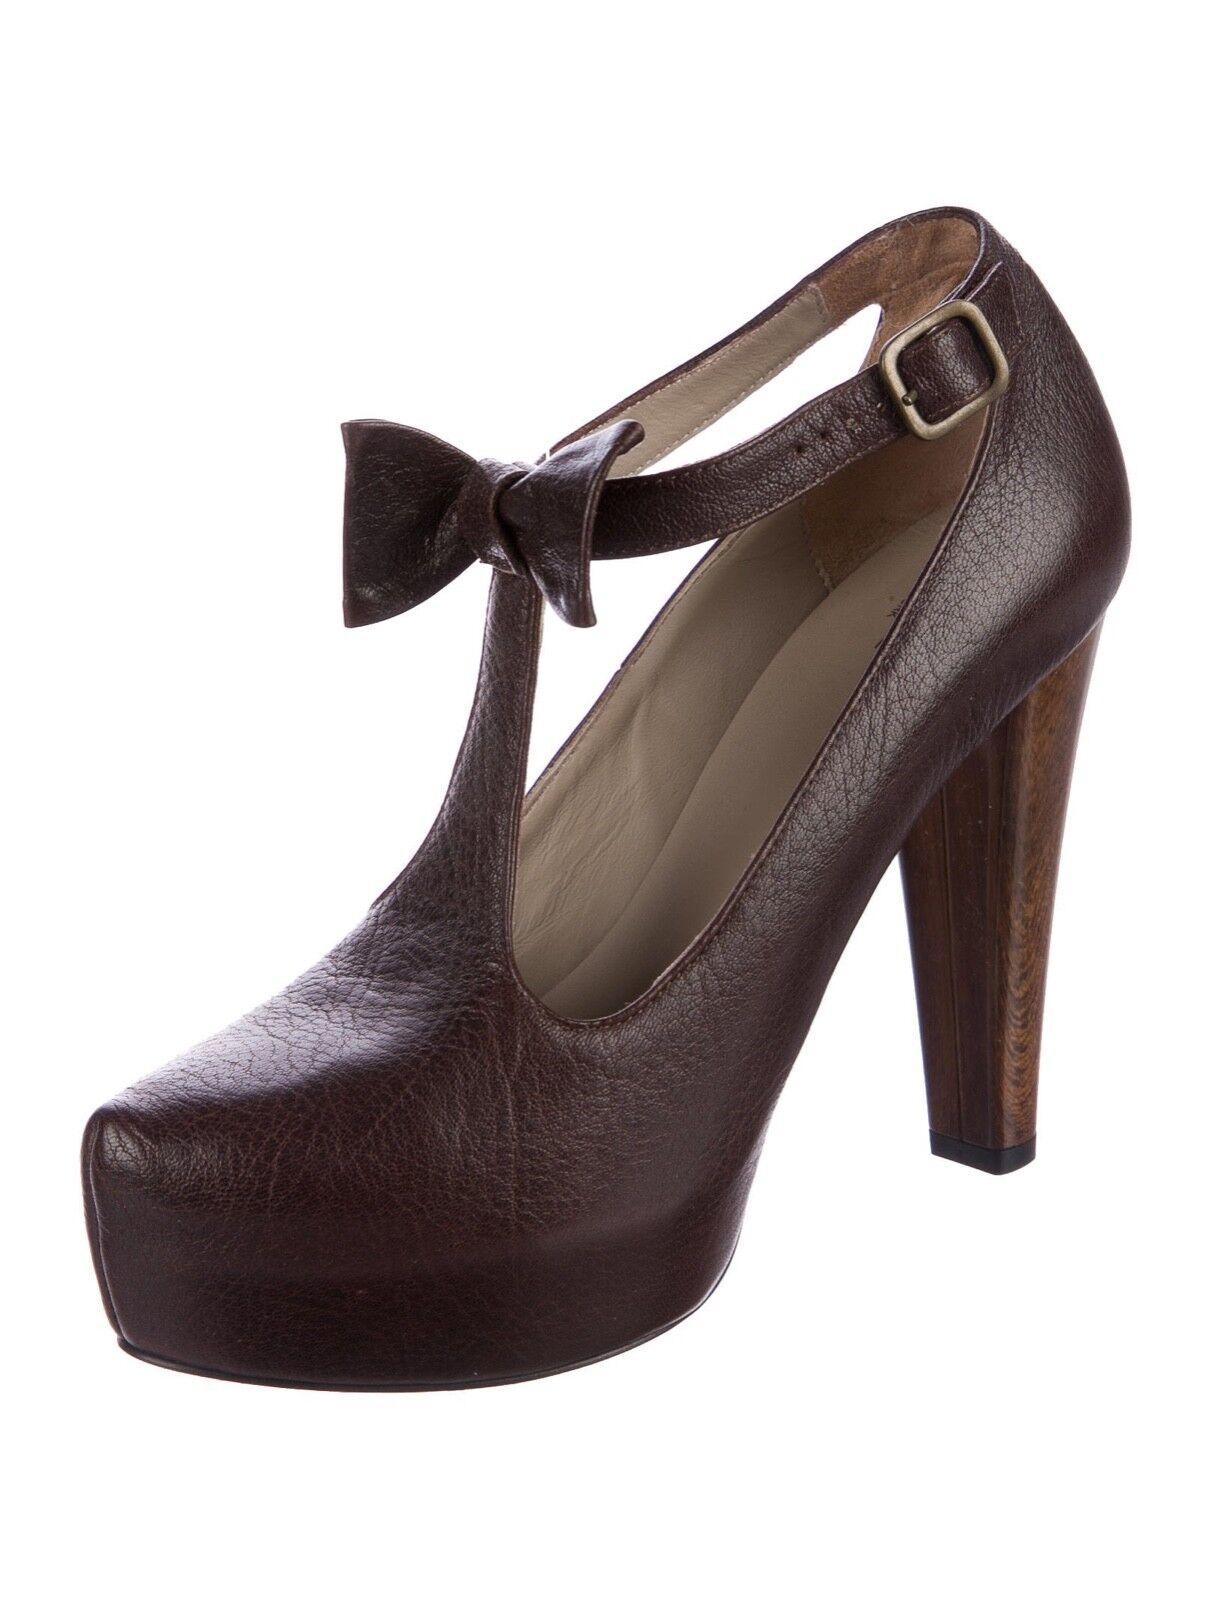 Tibi New York York York Old LuxePlatform T-Strap Mary Jane Heels 38.5 8.5 braun NIB  575 4dcdff